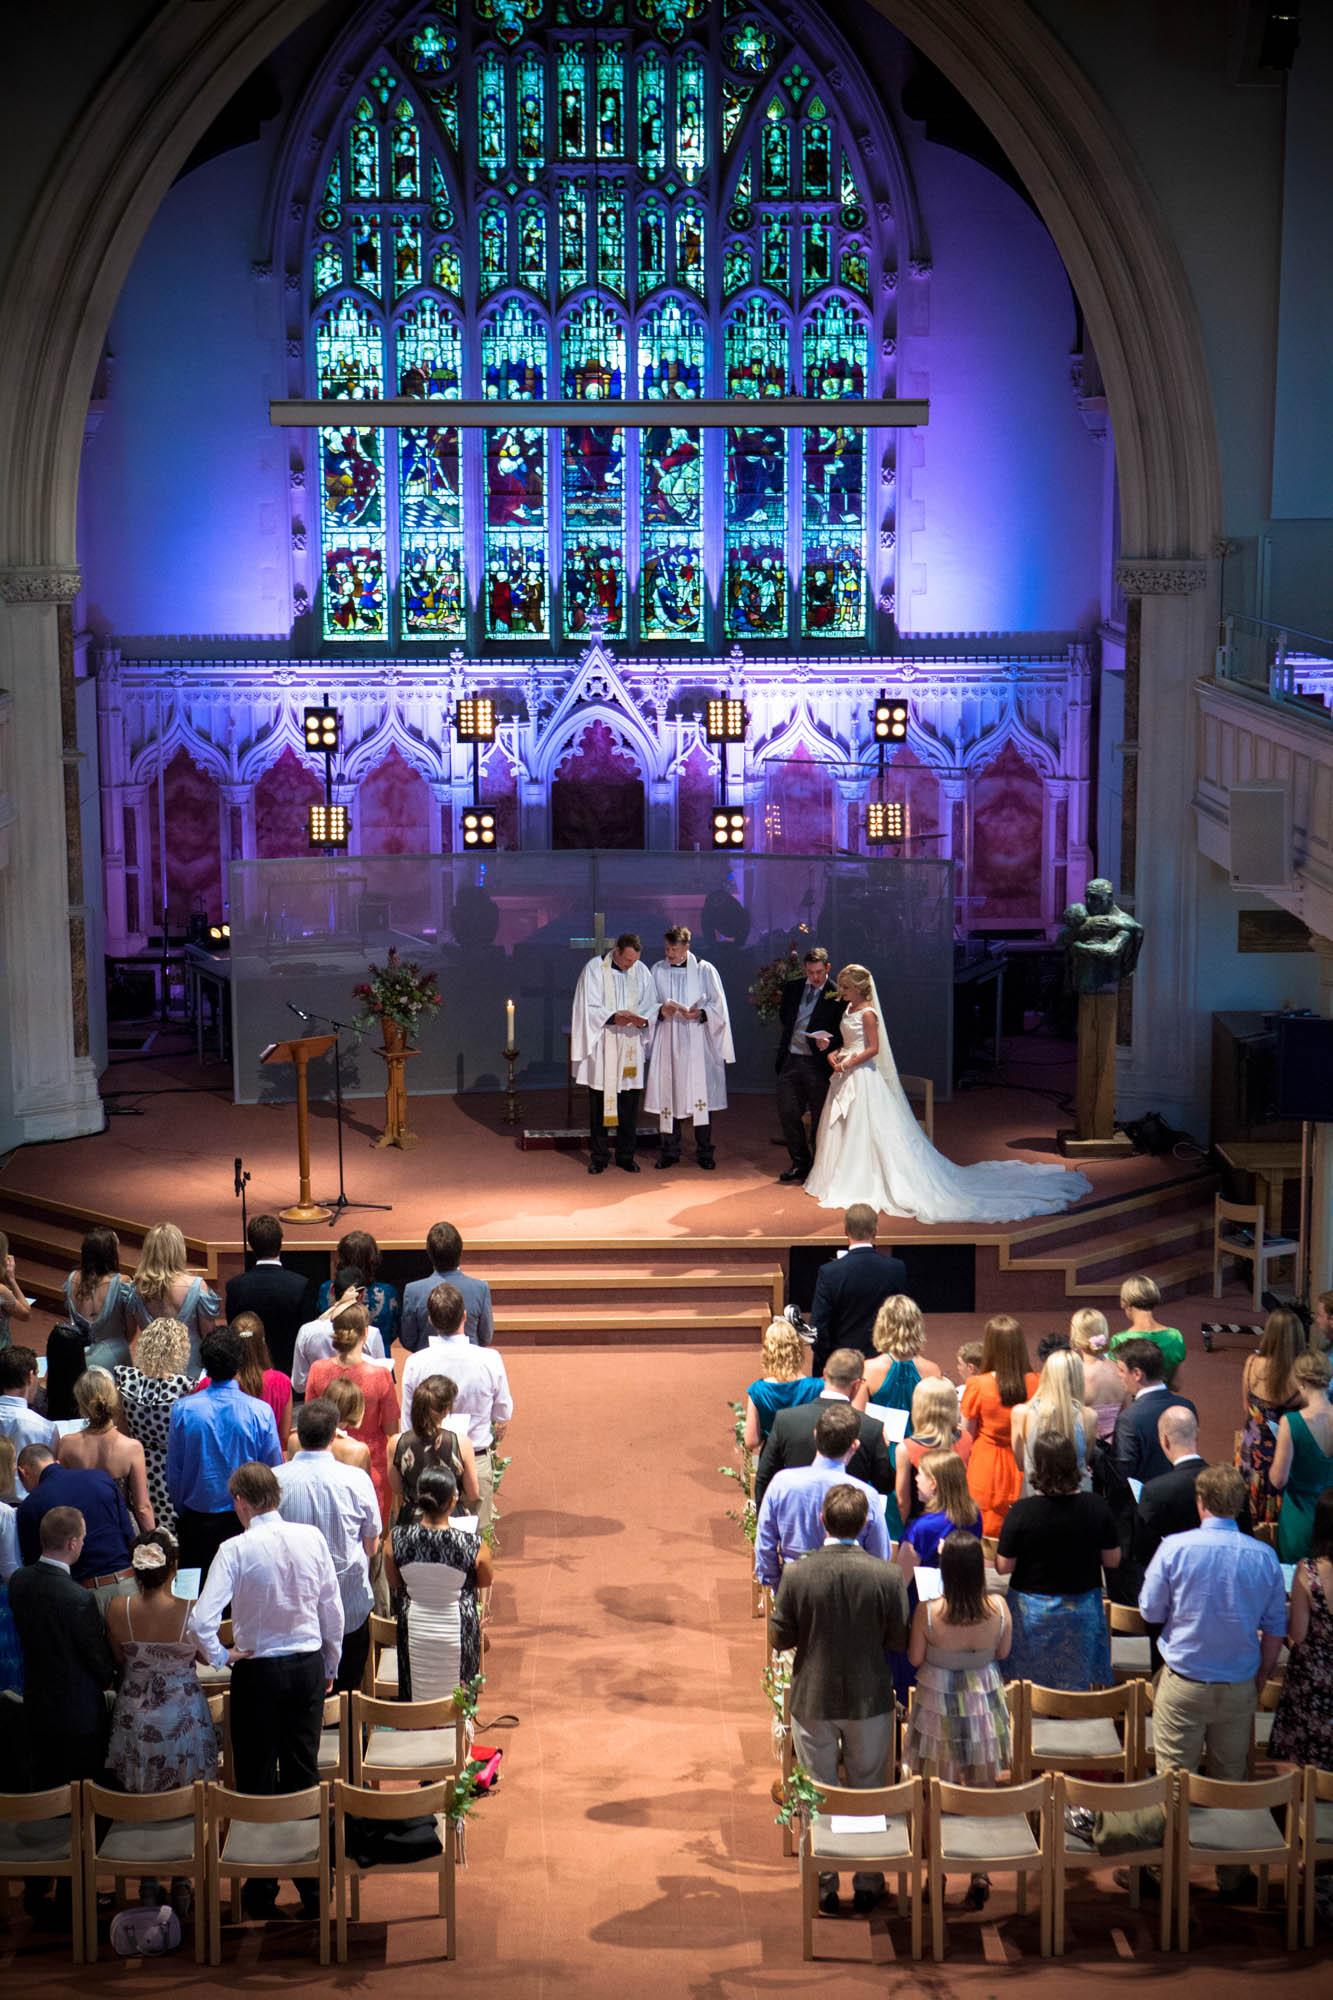 weddings-couples-love-photographer-oxford-london-jonathan-self-photography-31.jpg